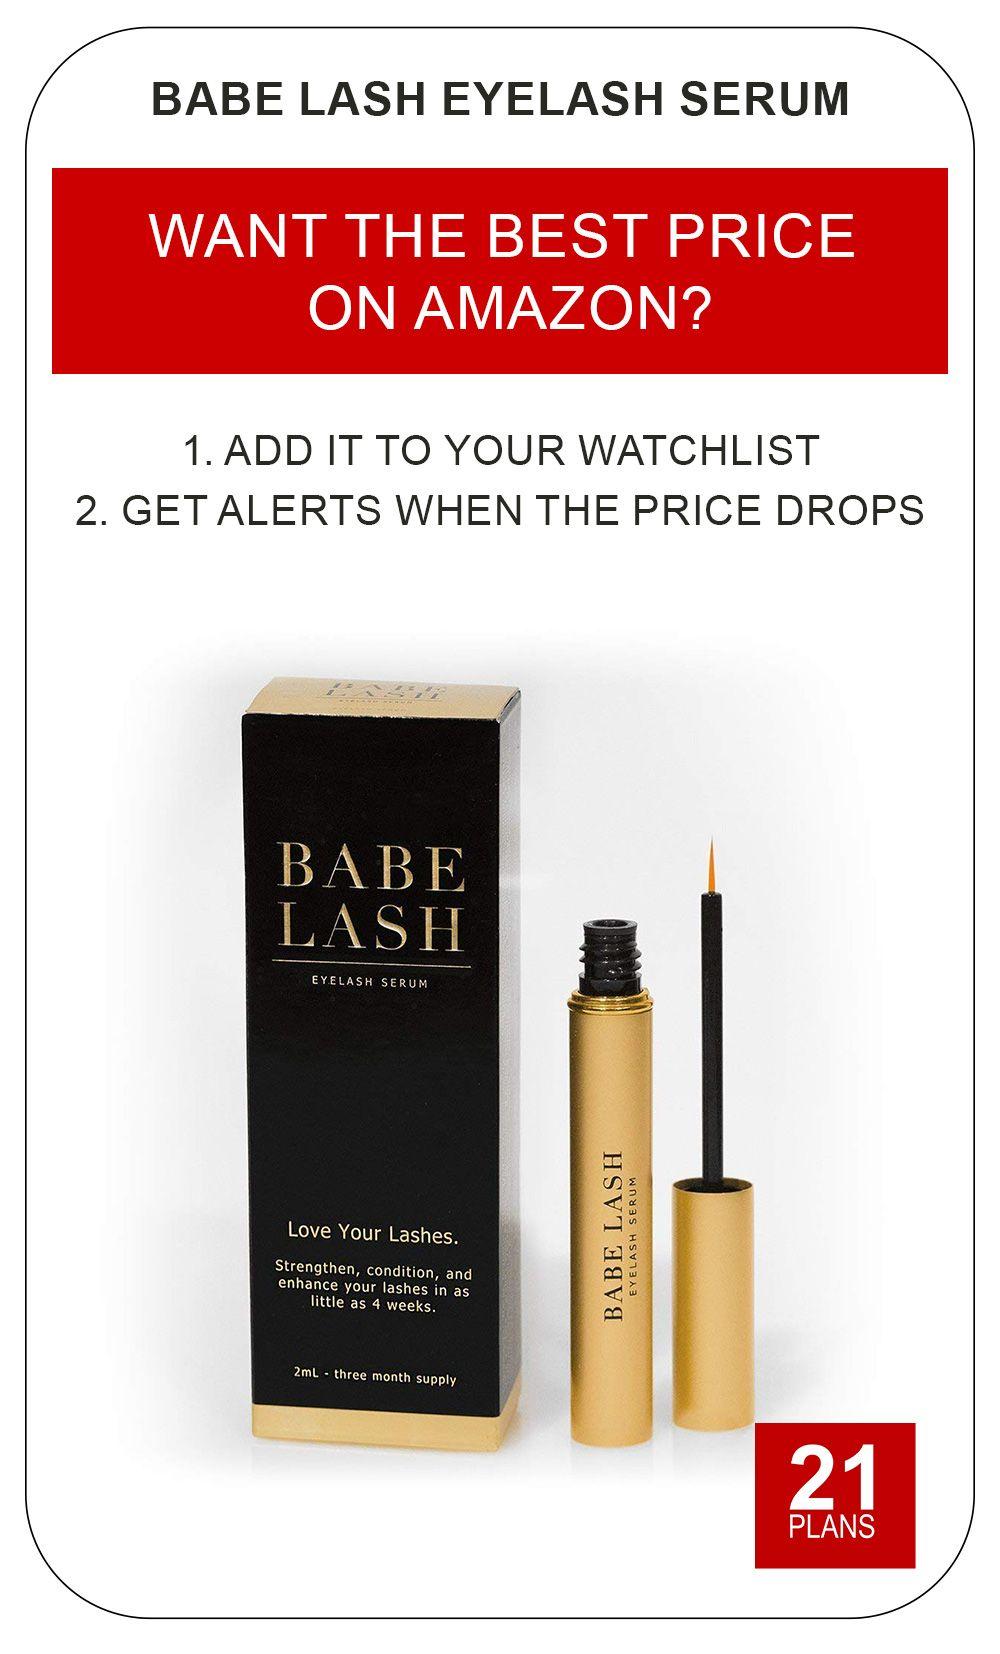 0d87305924d Babe Lash Eyelash Serum 2mL POWERFUL Brow & Lash Enhancing Formula for  Beautiful, Strong Lashes.